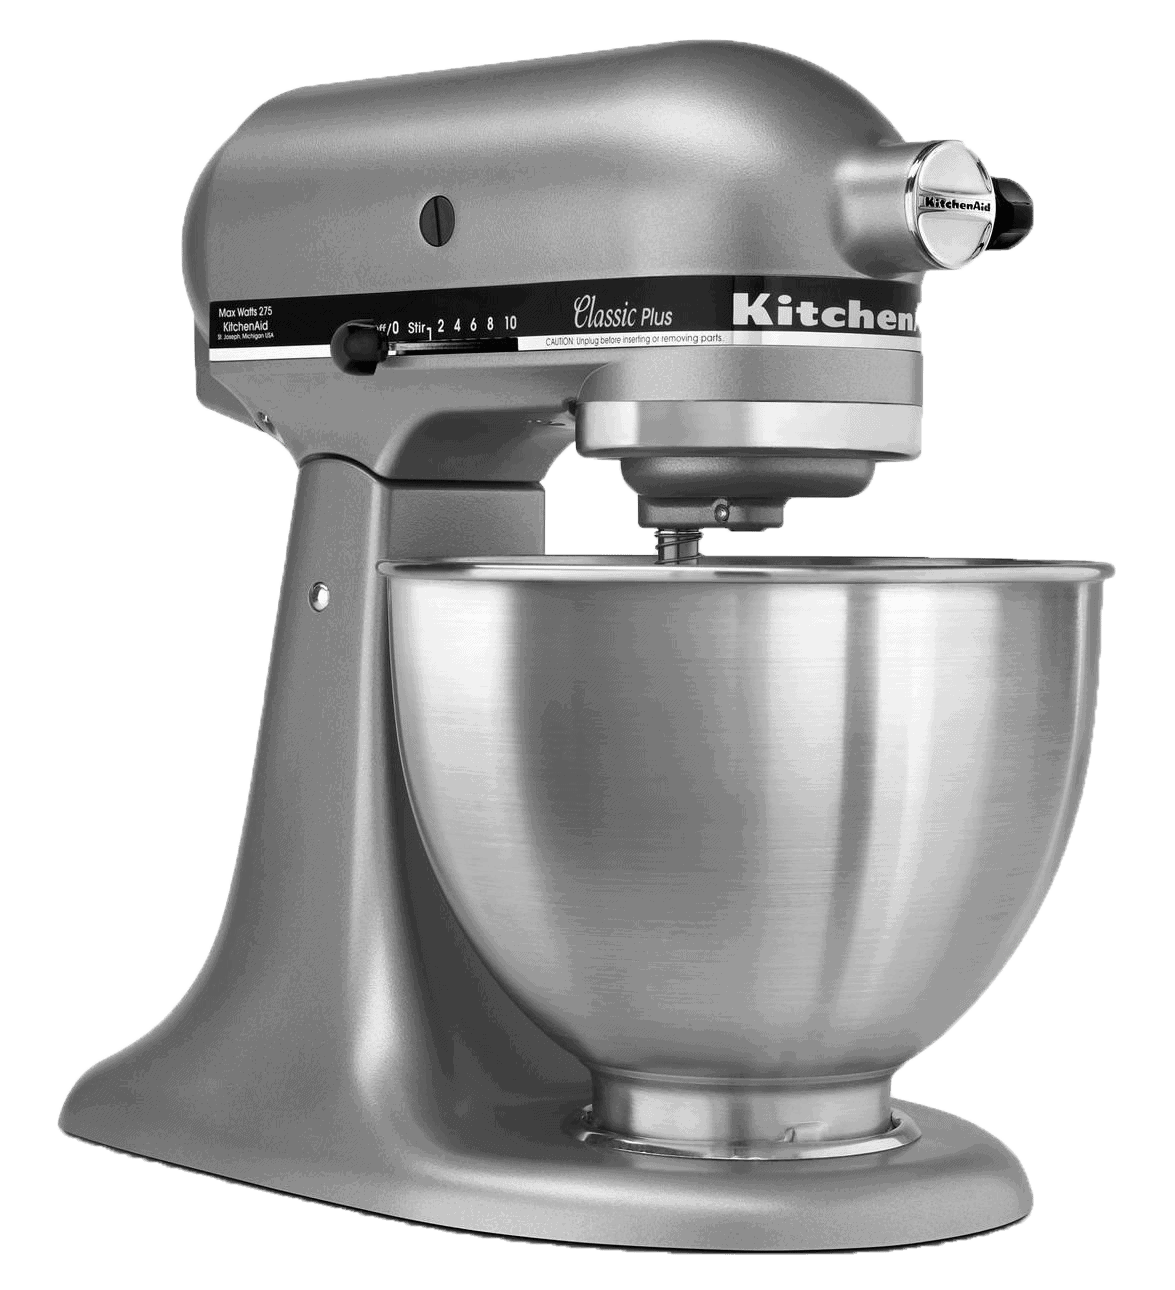 Classic Plus KitchenAid Mixer